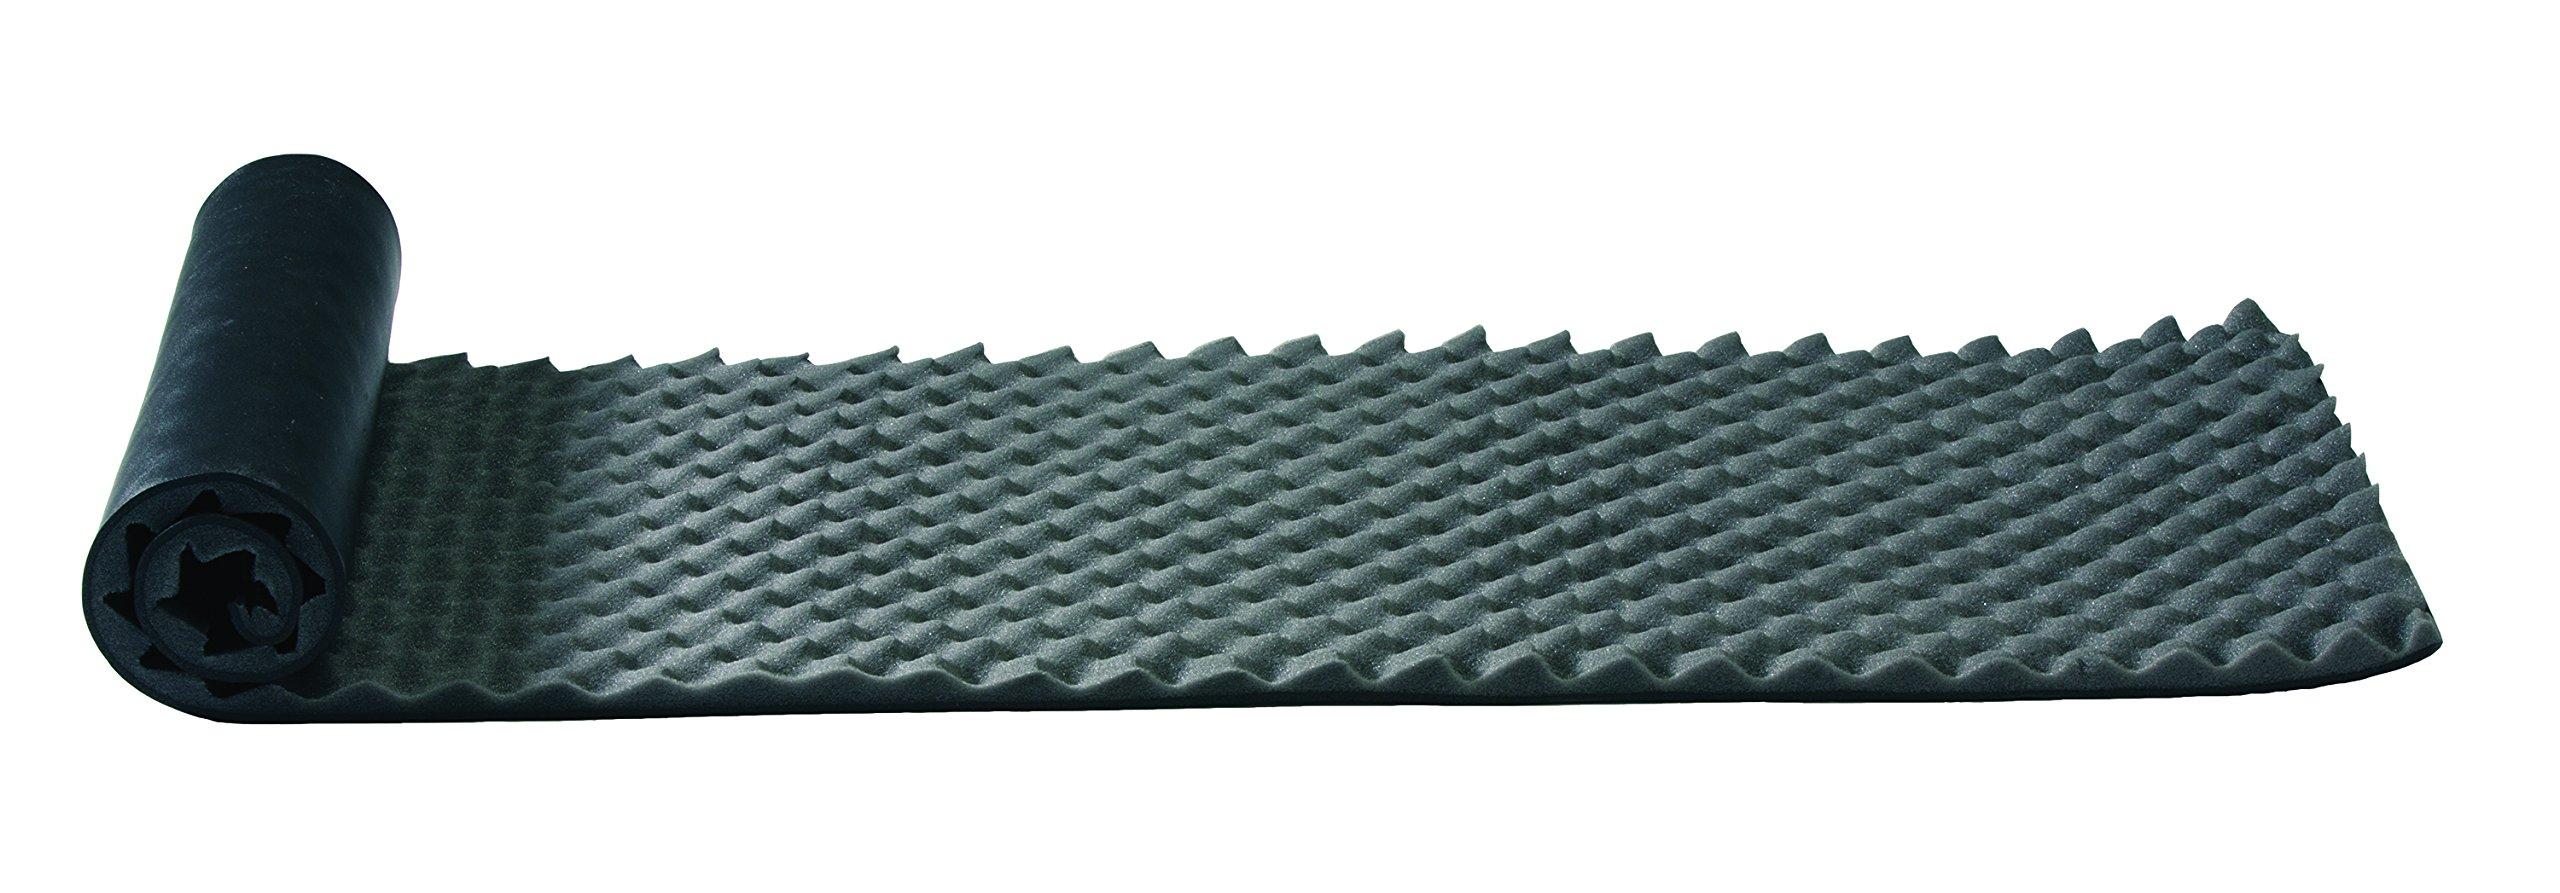 Texsport Dual Foam Lightweight Camping Sleeping Mat Pad by Texsport